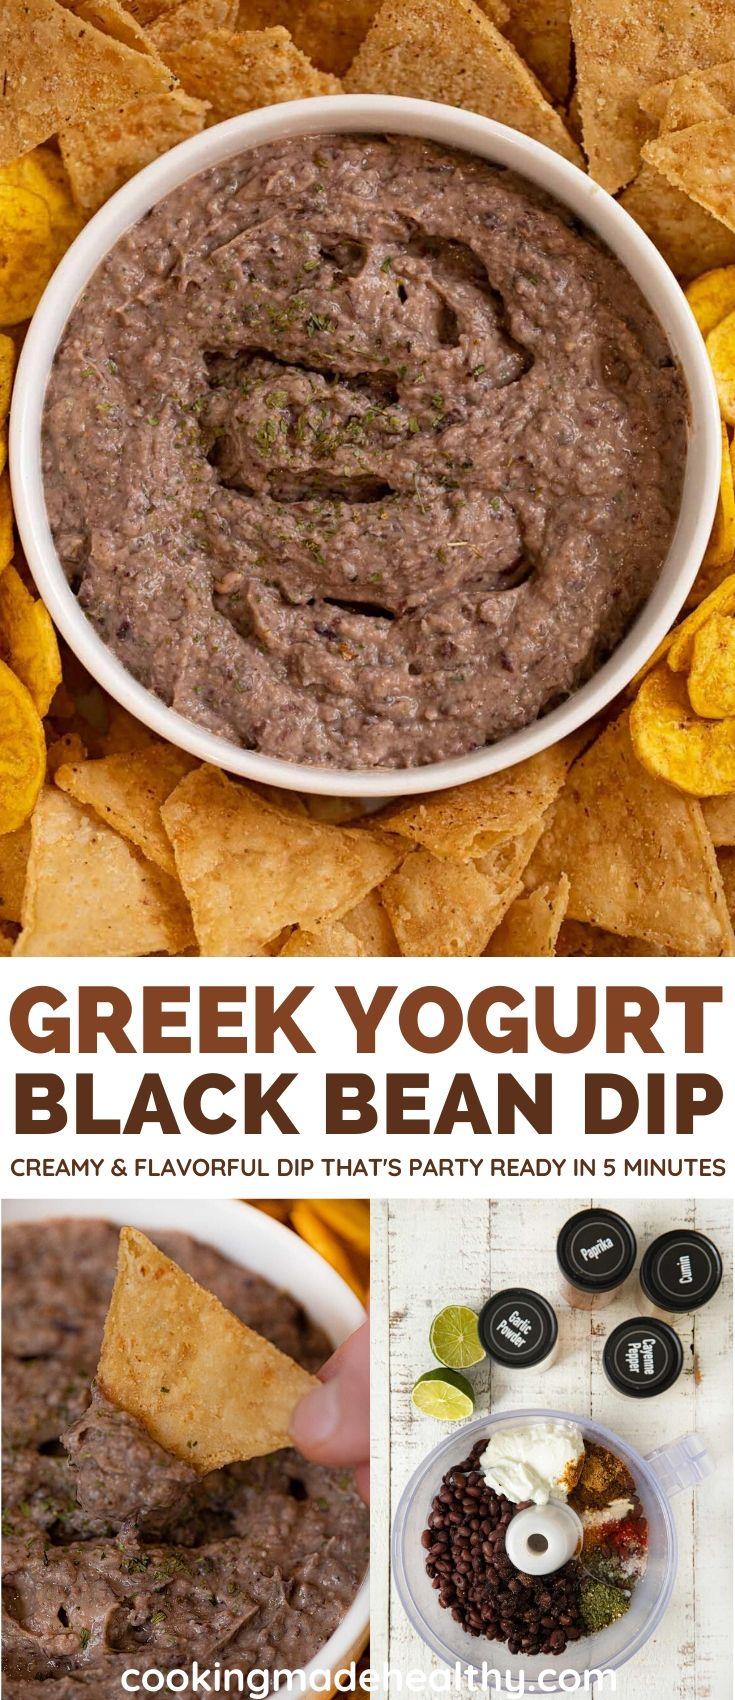 Creamy Black Bean Dip collage